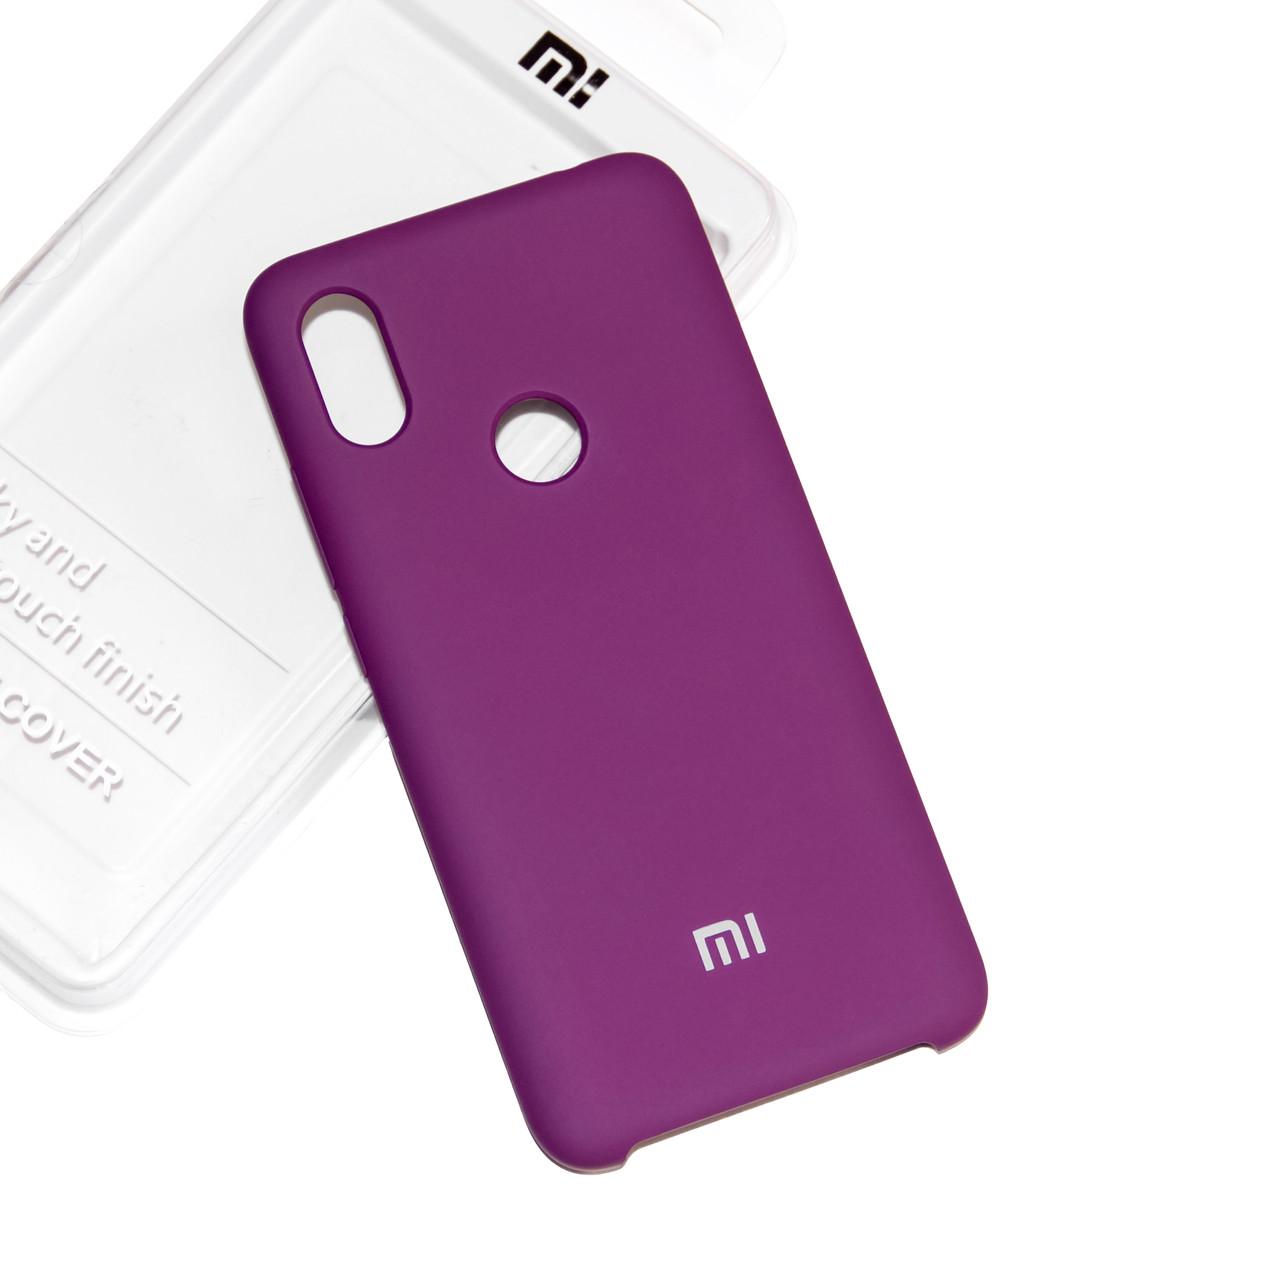 Силиконовый чехол на Xiaomi Redmi Note 6 Pro Soft-touch Fuchsia